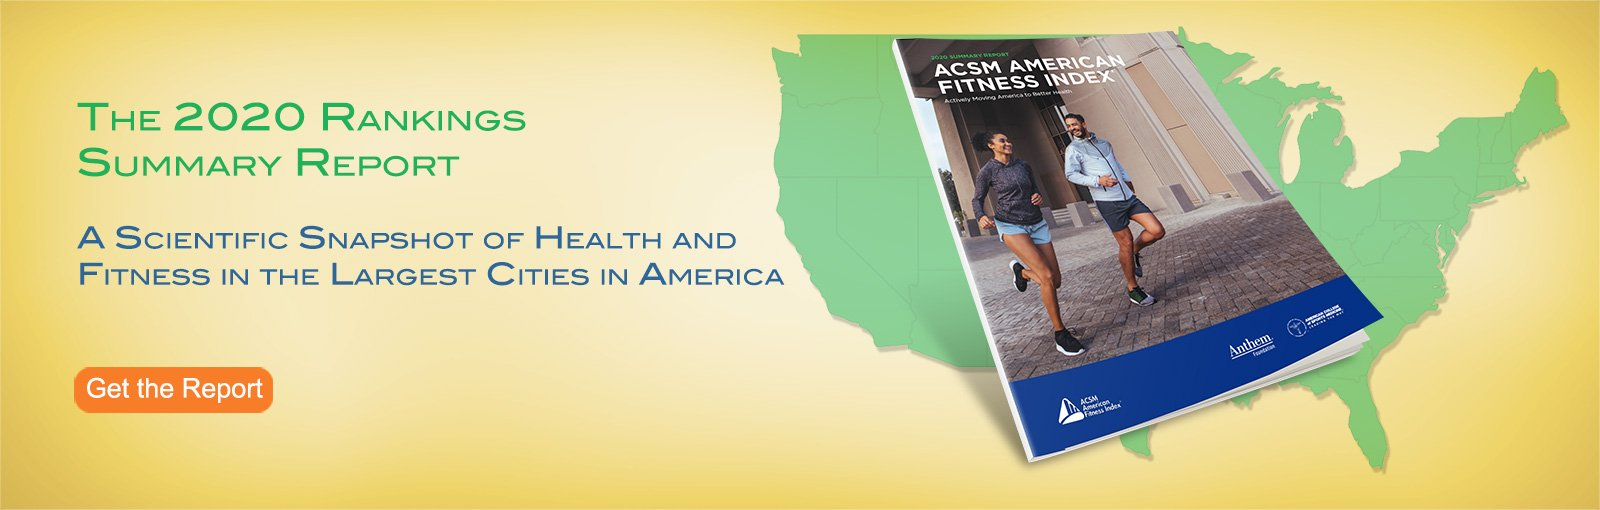 acsm-american-fitness-index-2020-rankings-summary-reportl